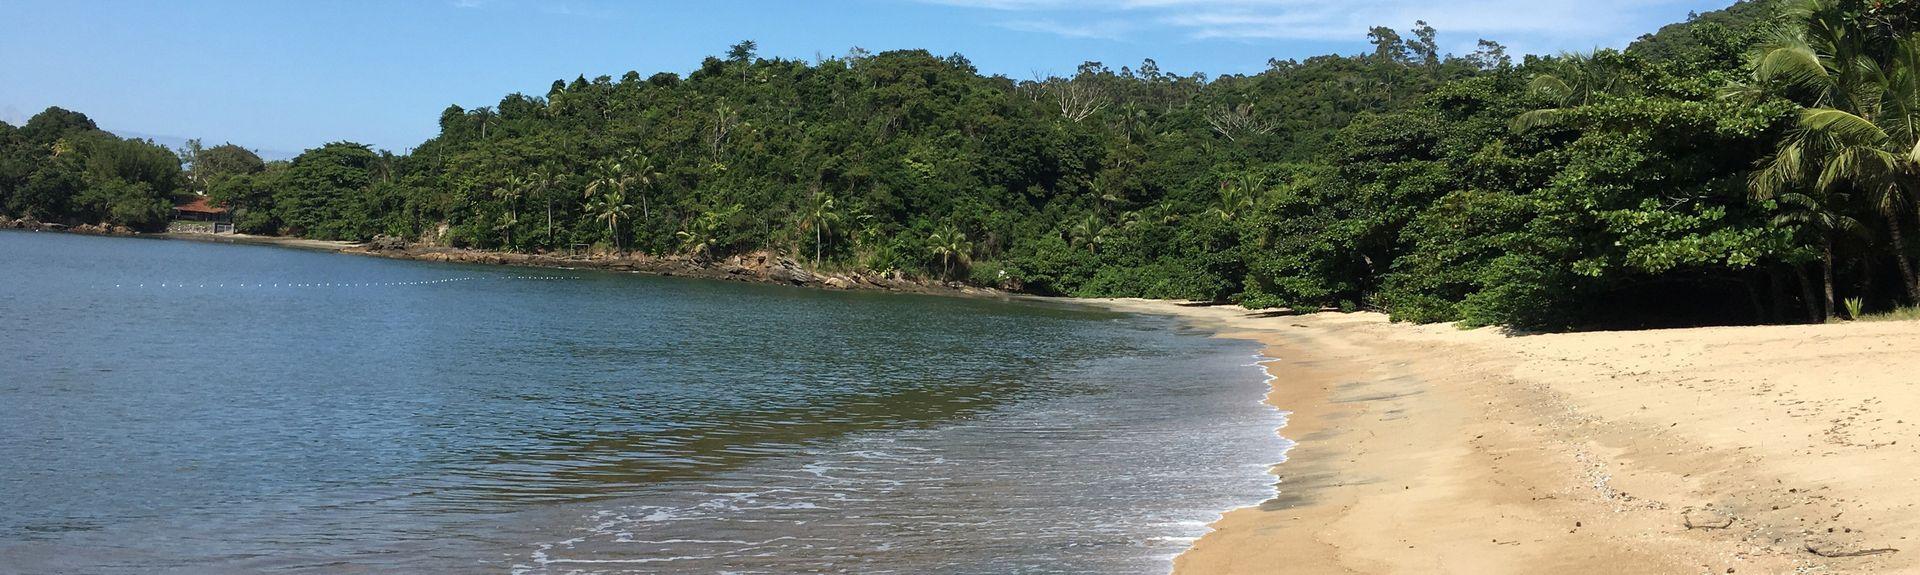 Praia Pan Brasil, Caraguatatuba, São Paulo, Brasil